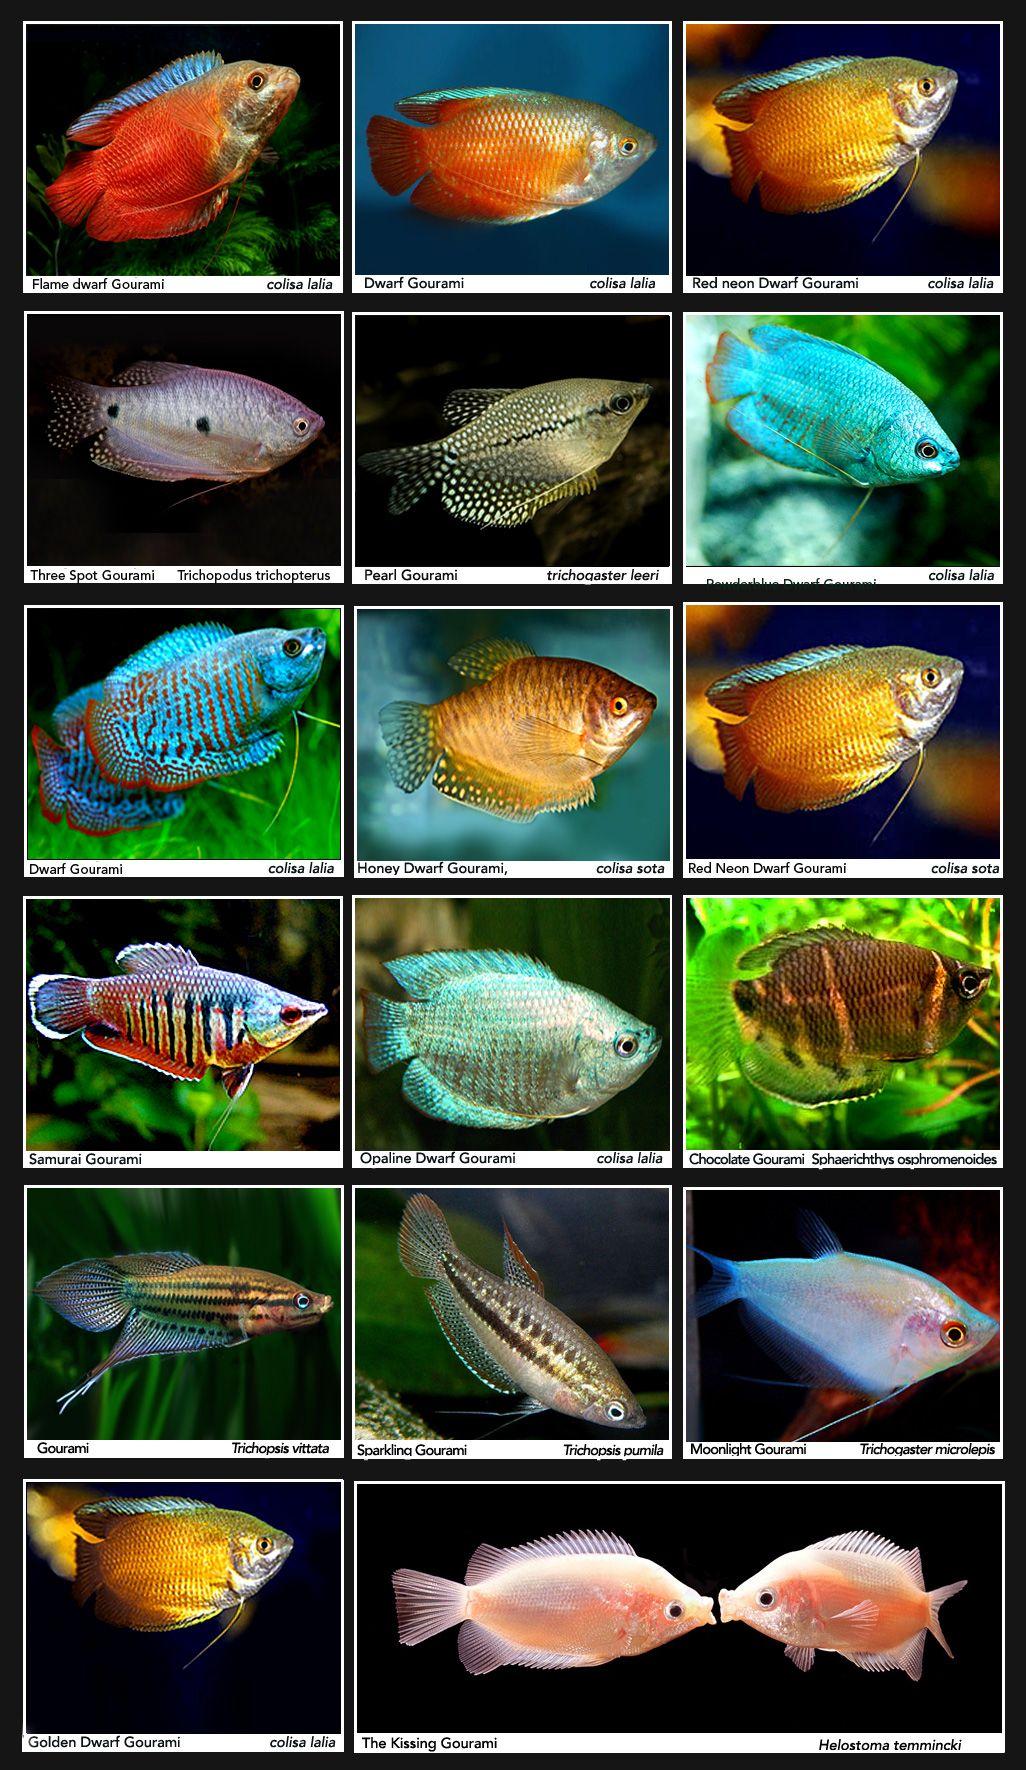 Gourami Fish Tank | Theme: Coraline by Automattic . Proudly powered ...